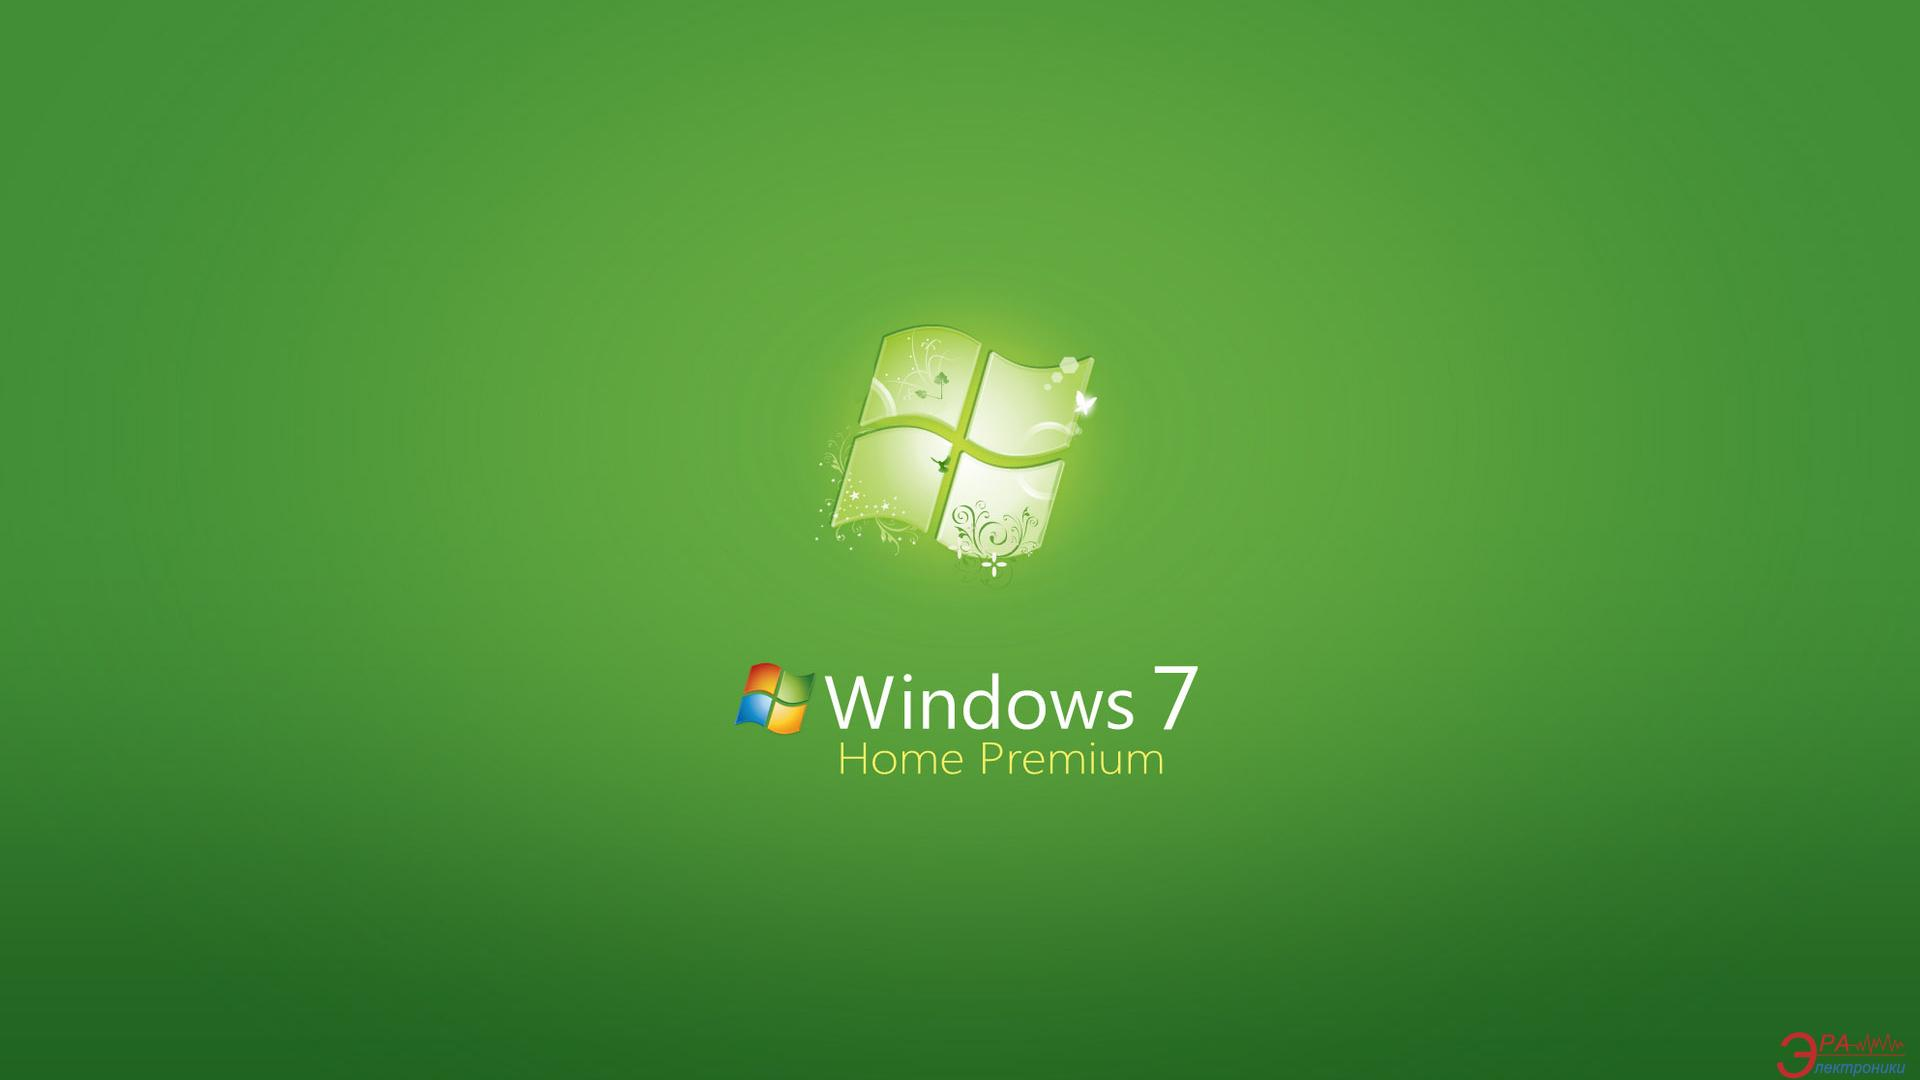 Операционная система Microsoft Windows 7 SP1 Home Premium 64-bit Russian CIS-Georgia (GFC-02750) OEM